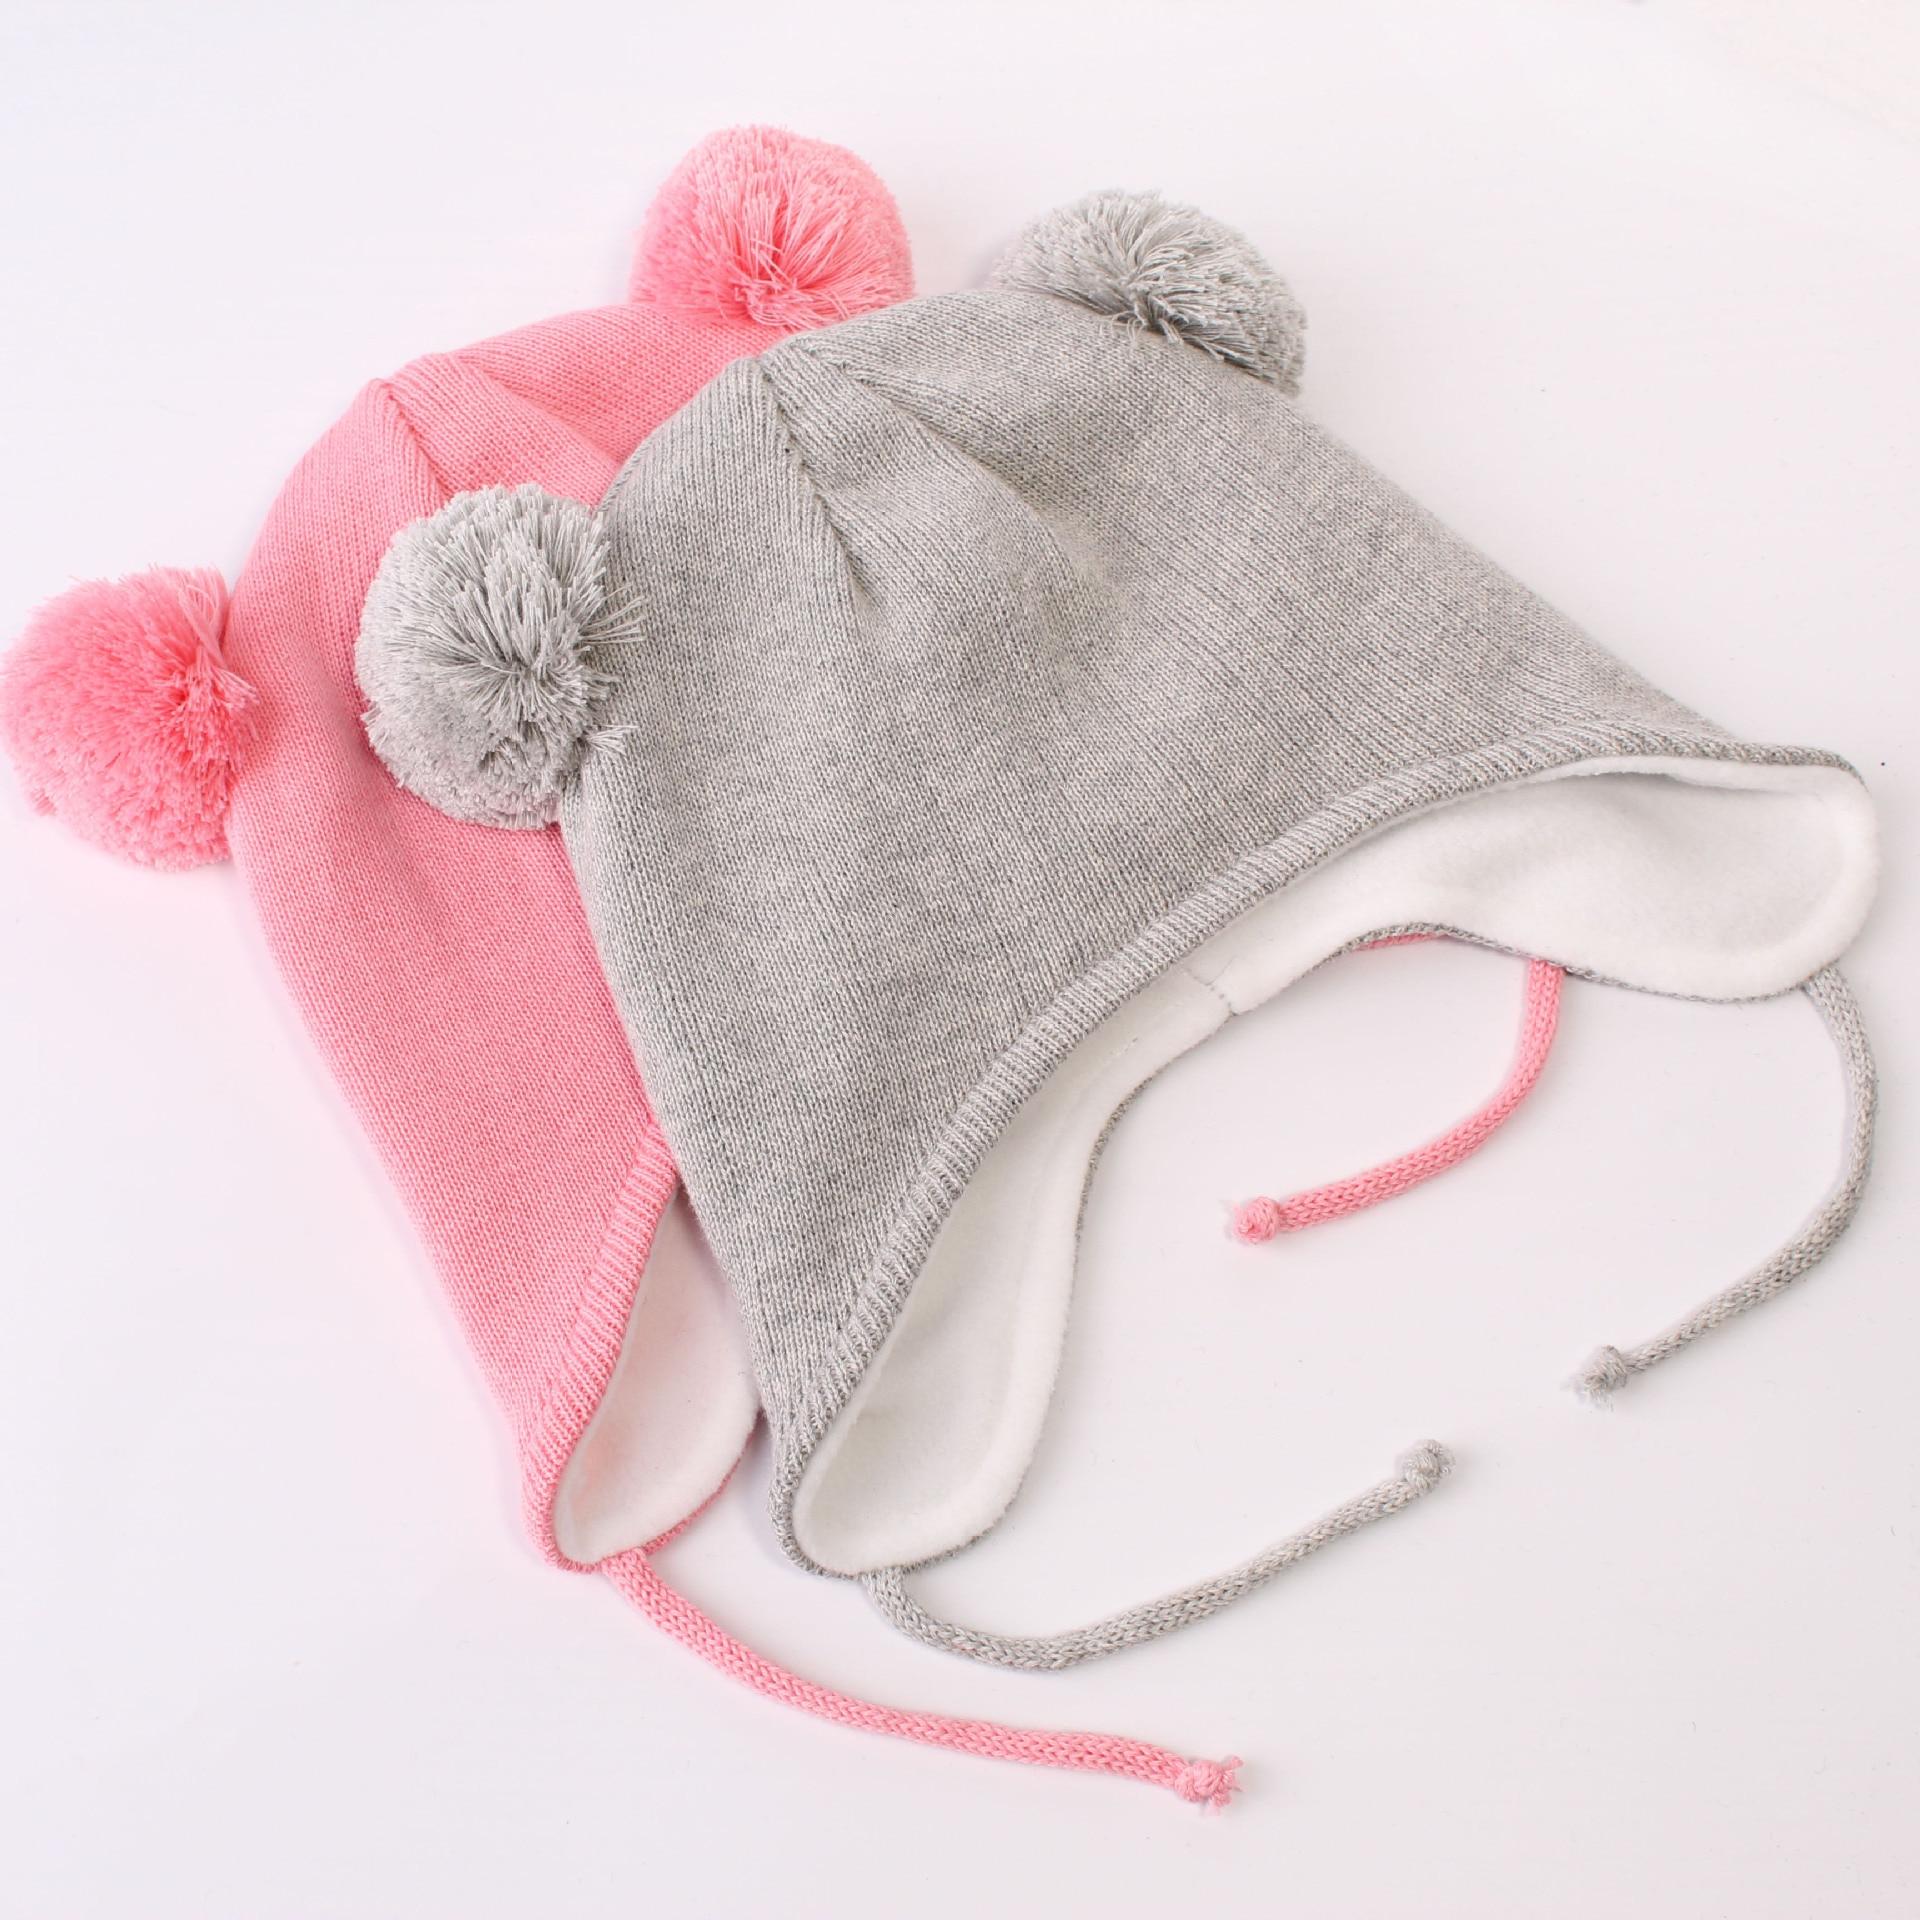 Girls Boys Winter Warm Hat Toddler Earflap Hood Baby Fleece Lining Beanie Cap